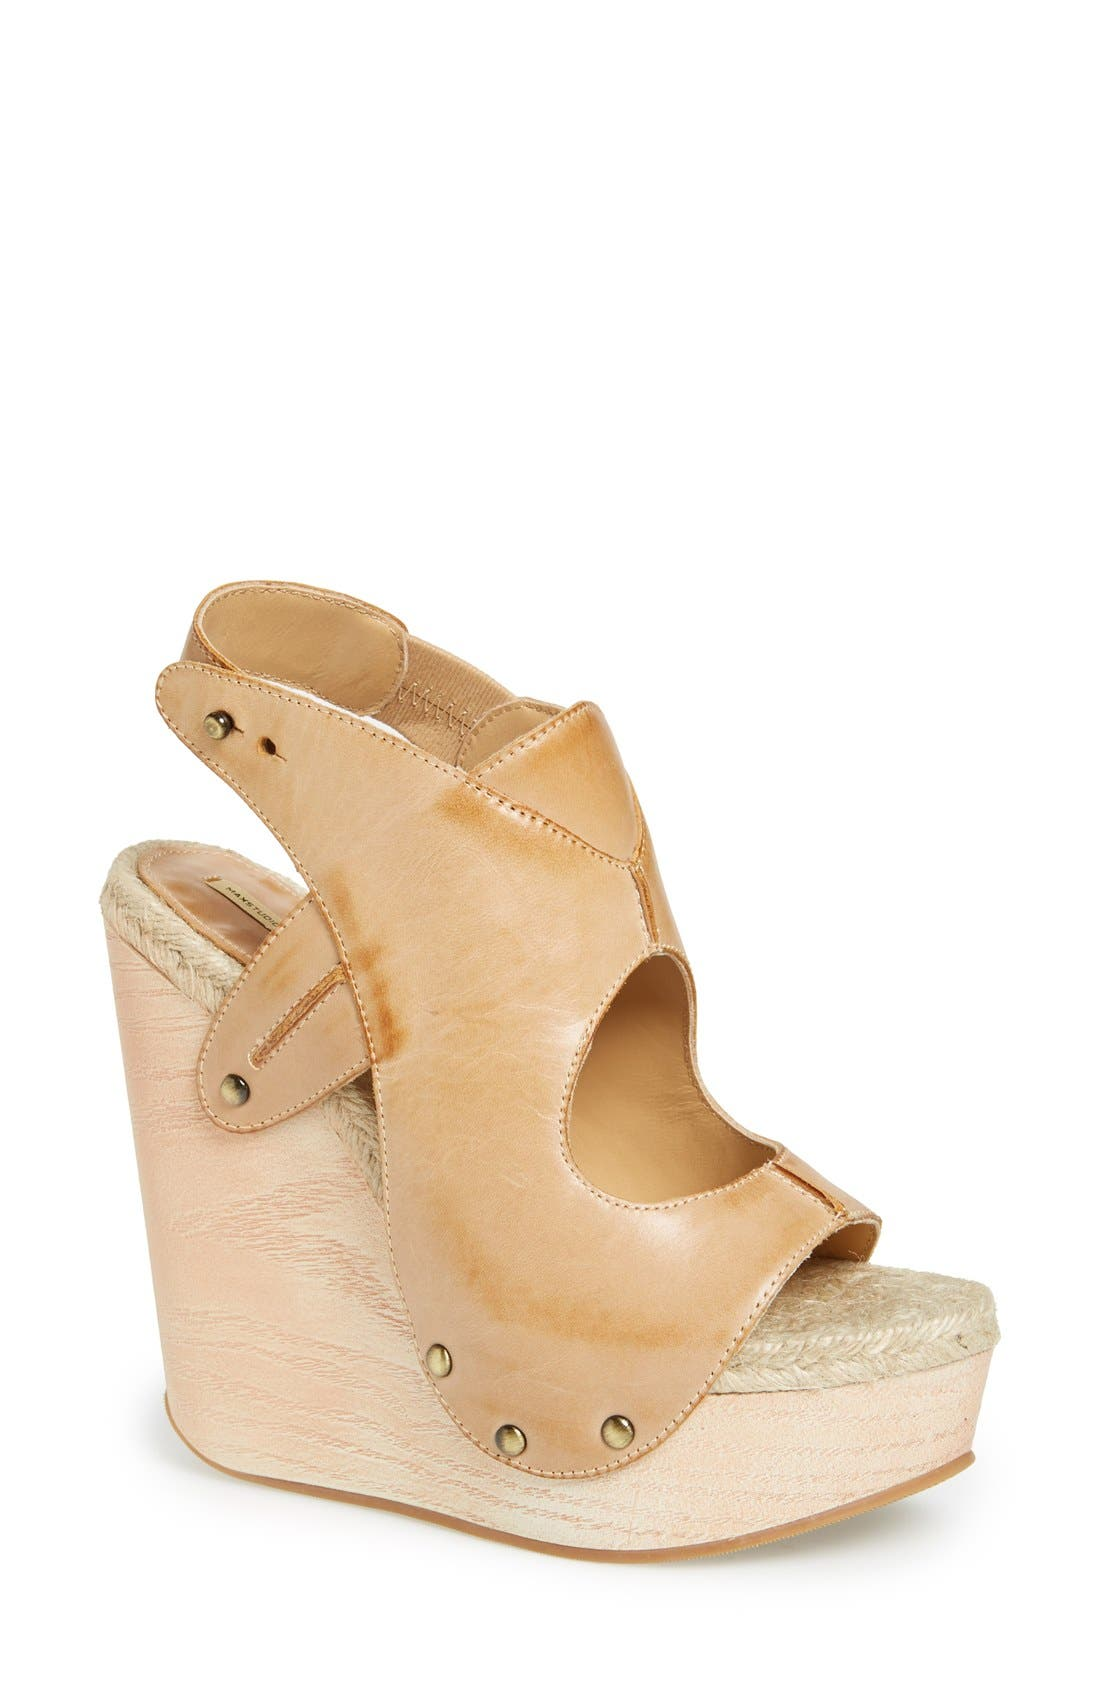 Alternate Image 1 Selected - MAXSTUDIO 'Fiore' Platform Wedge Sandal (Women)